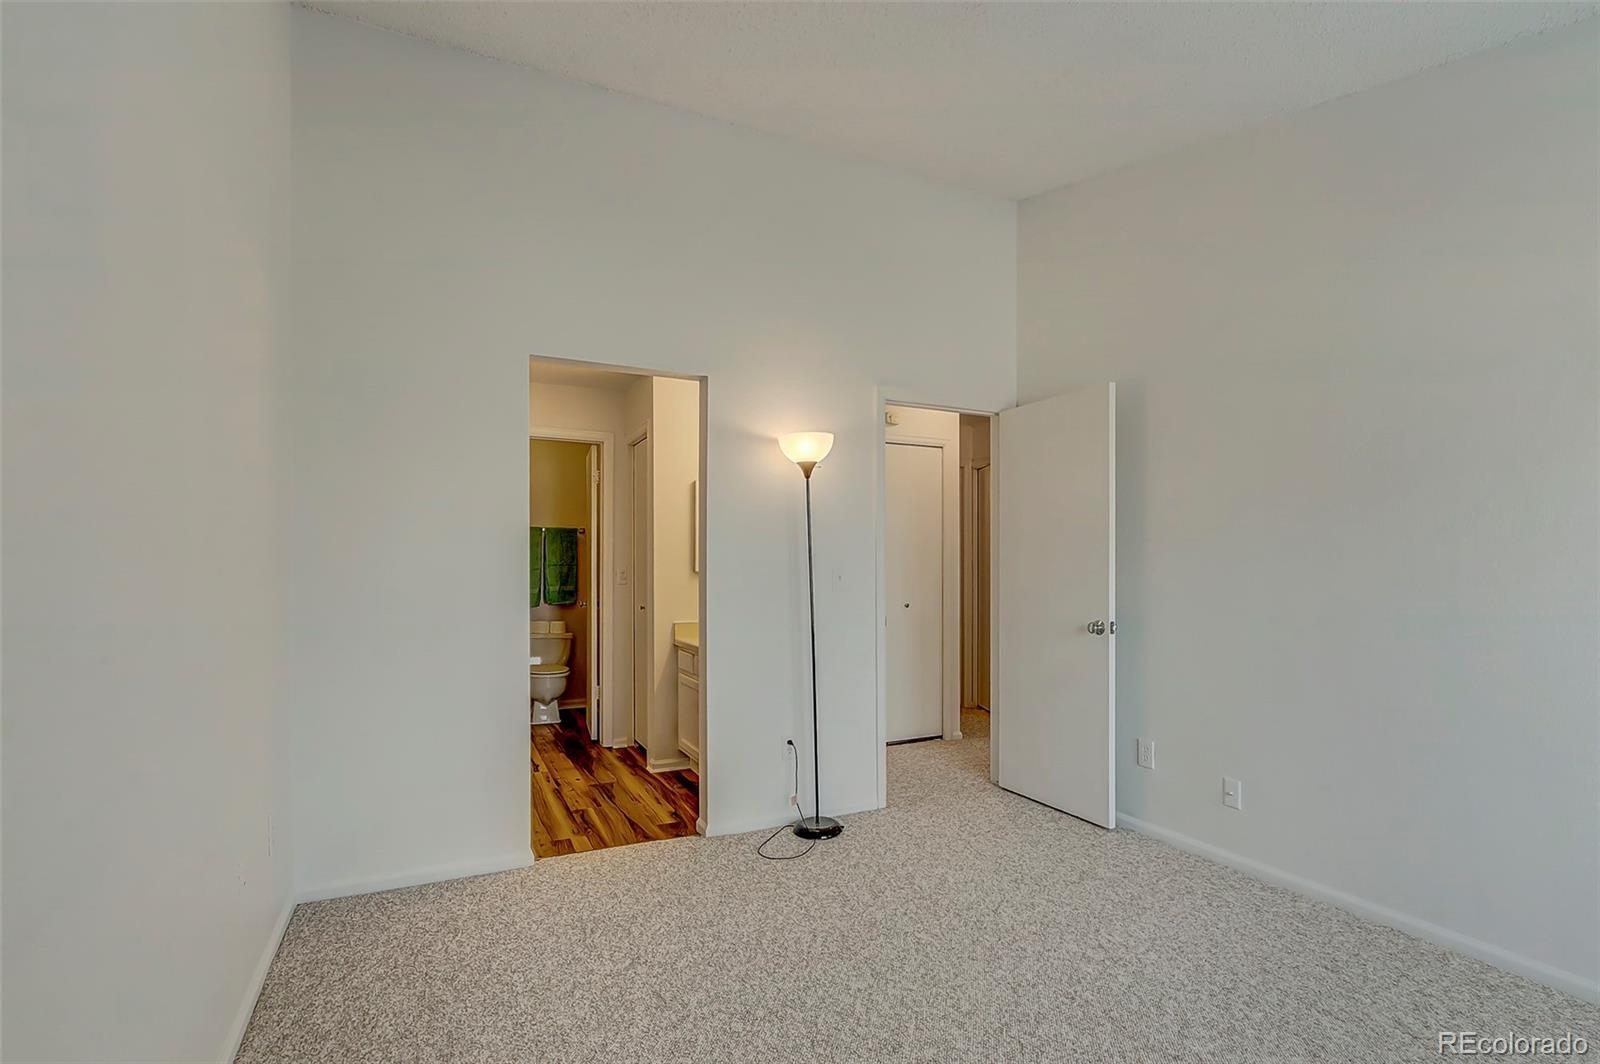 MLS# 3356784 - 20 - 8035 W Eastman Place #306, Lakewood, CO 80227